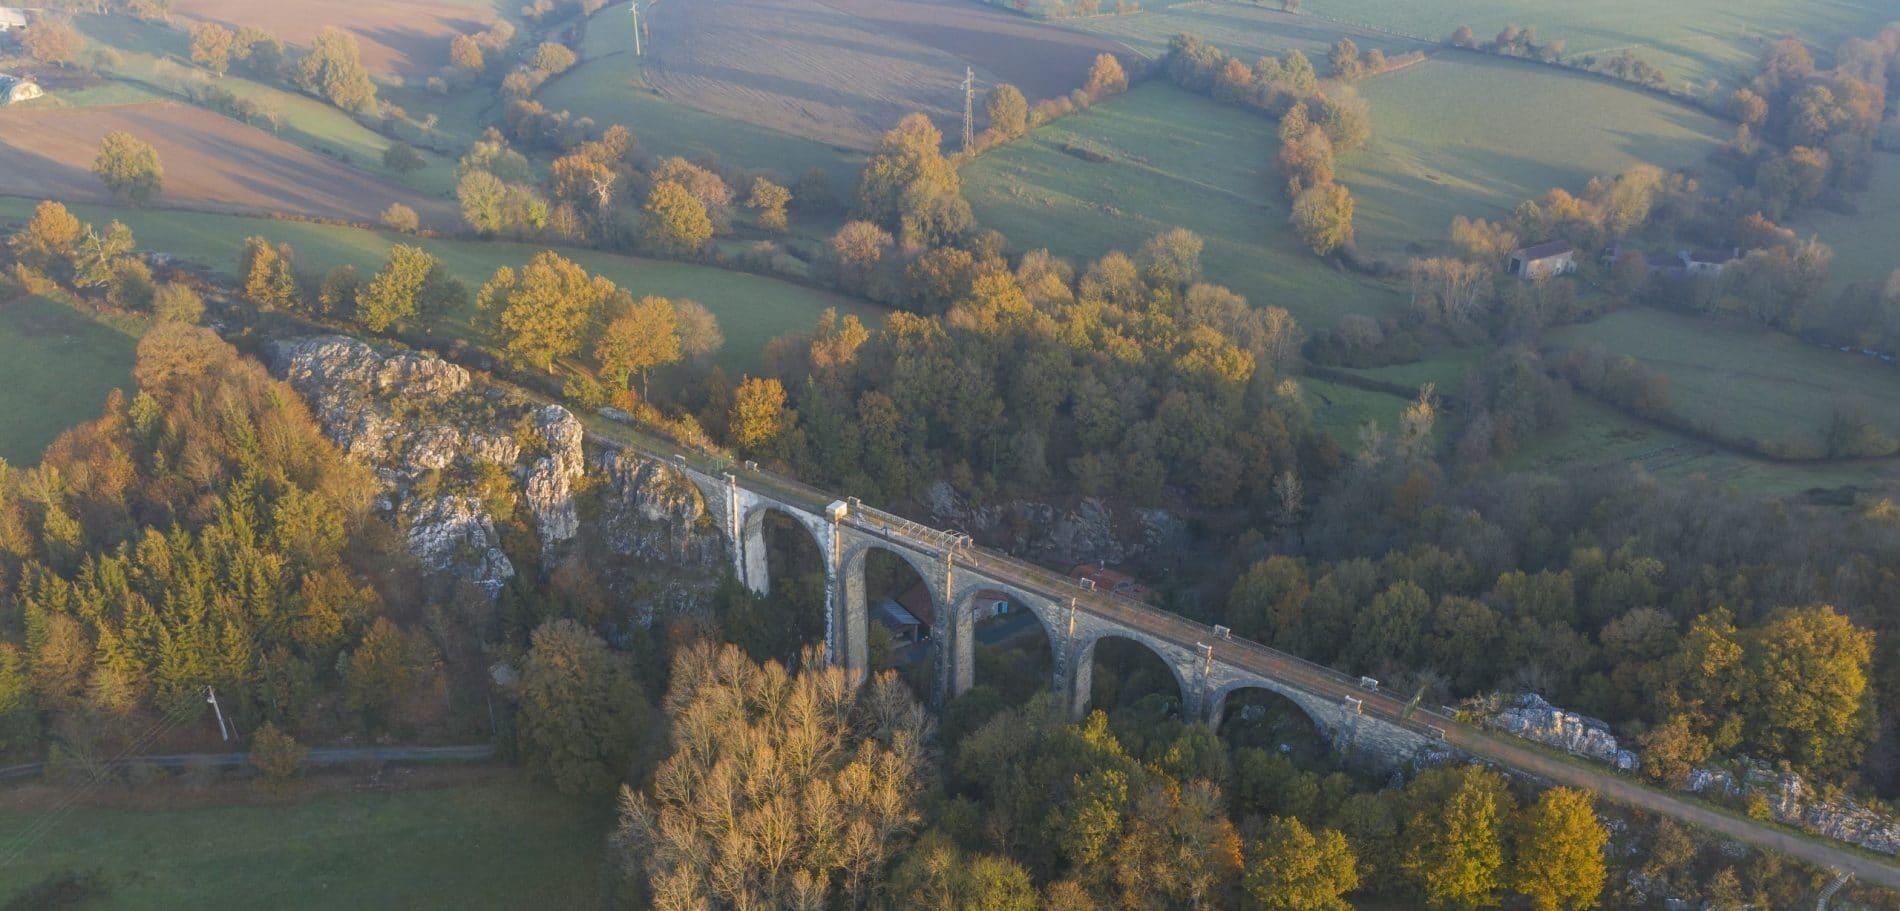 Viaduc de Coquilleau Breuil Barret © Vendeeexpansion_Julien Gazeau